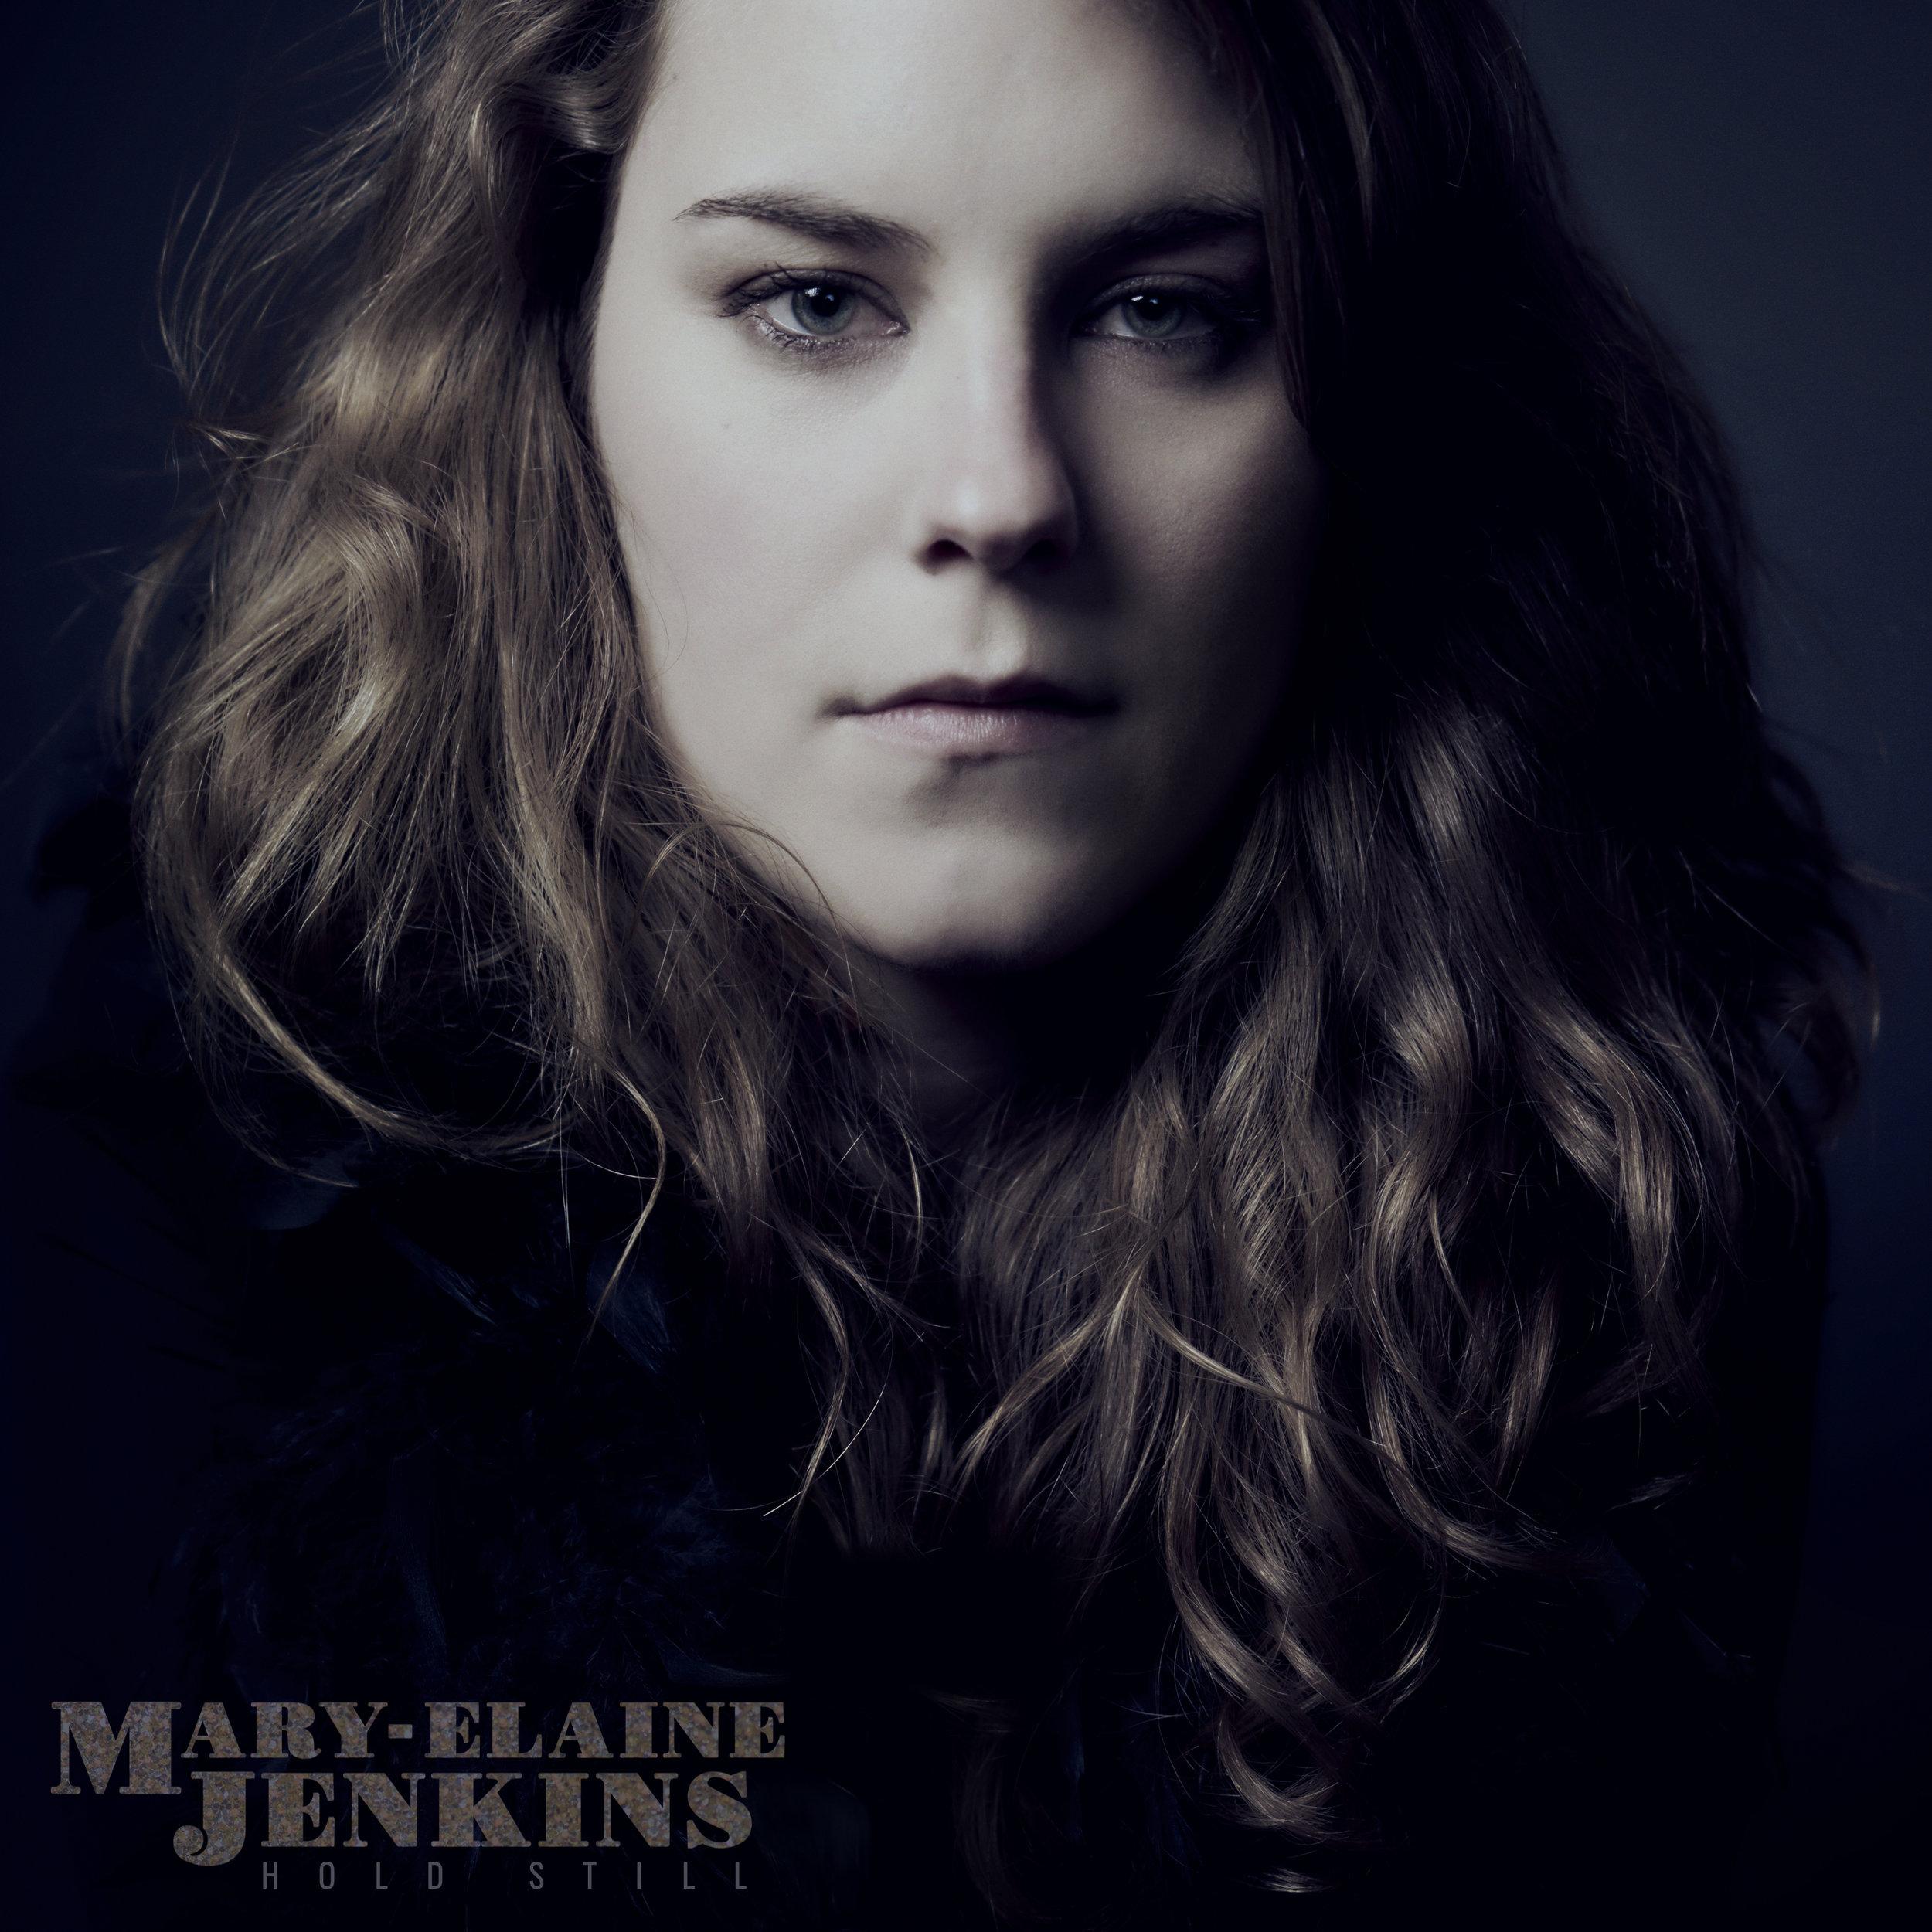 MARY-ELAINE JENKINS_HOLD STILL_ART.jpg